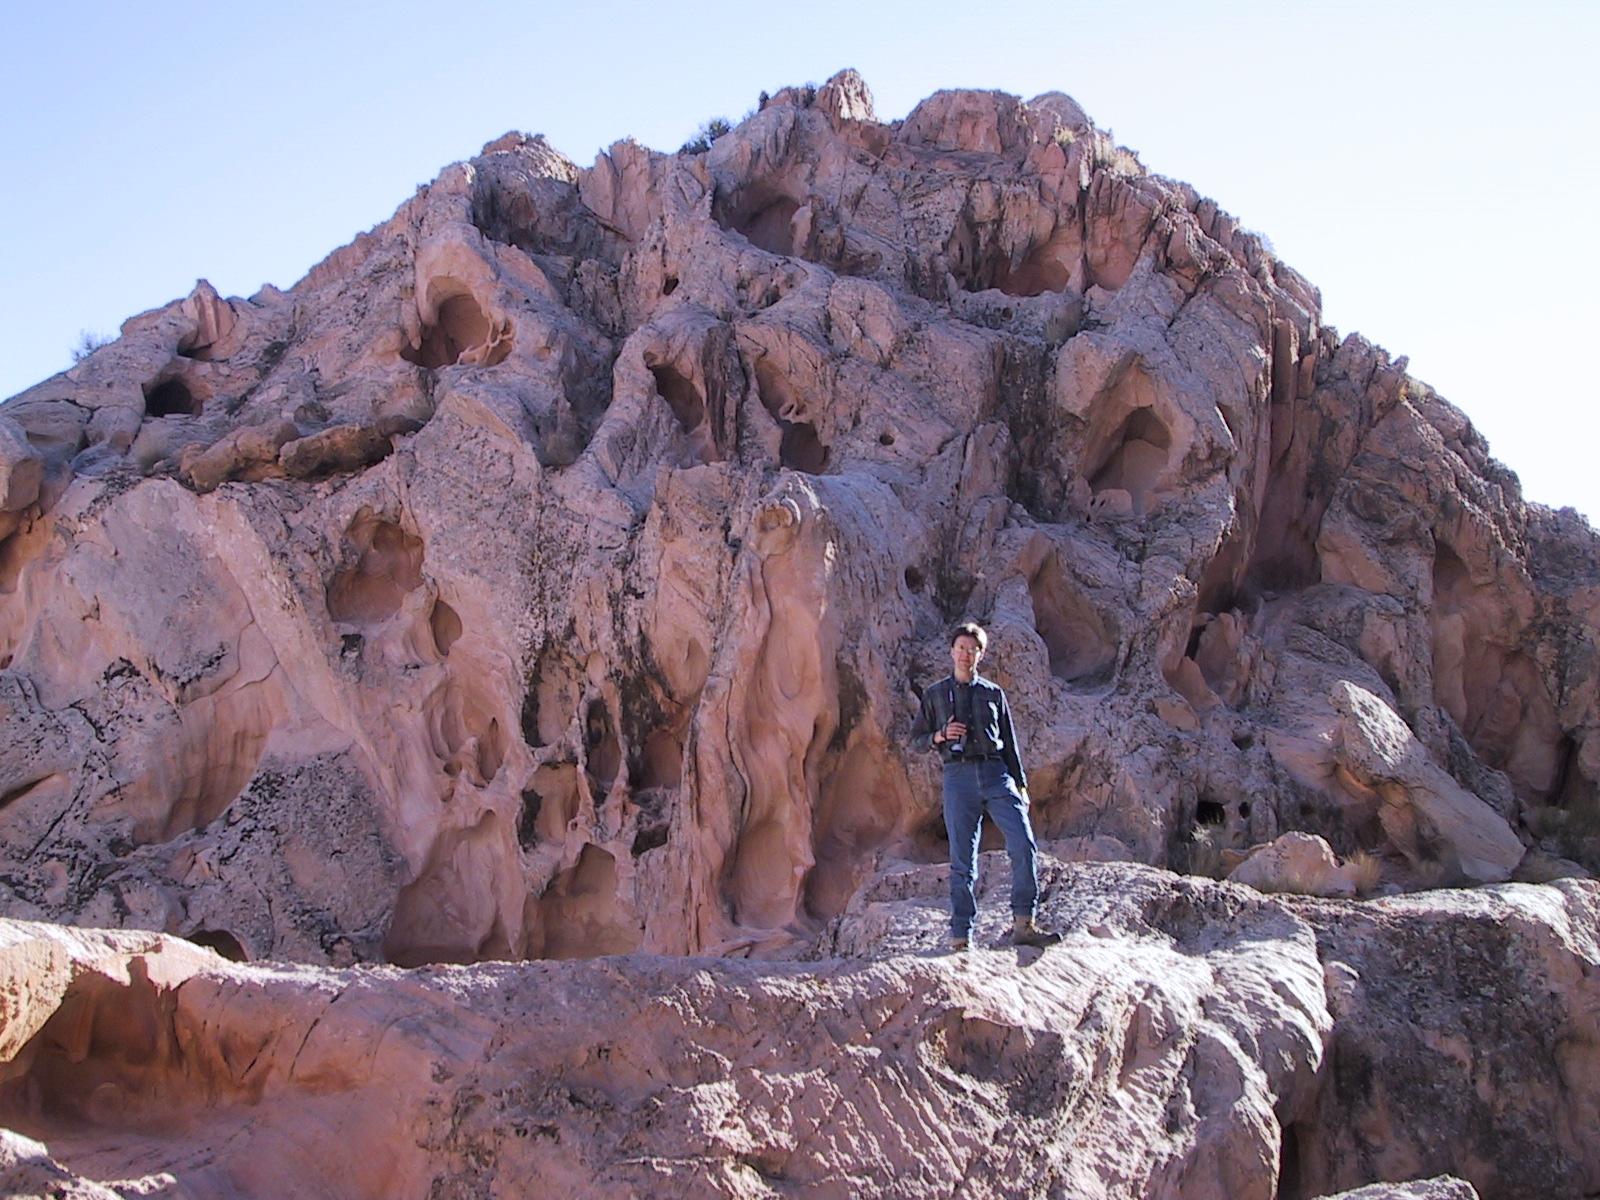 Joe posing in front of an eroded rock hill